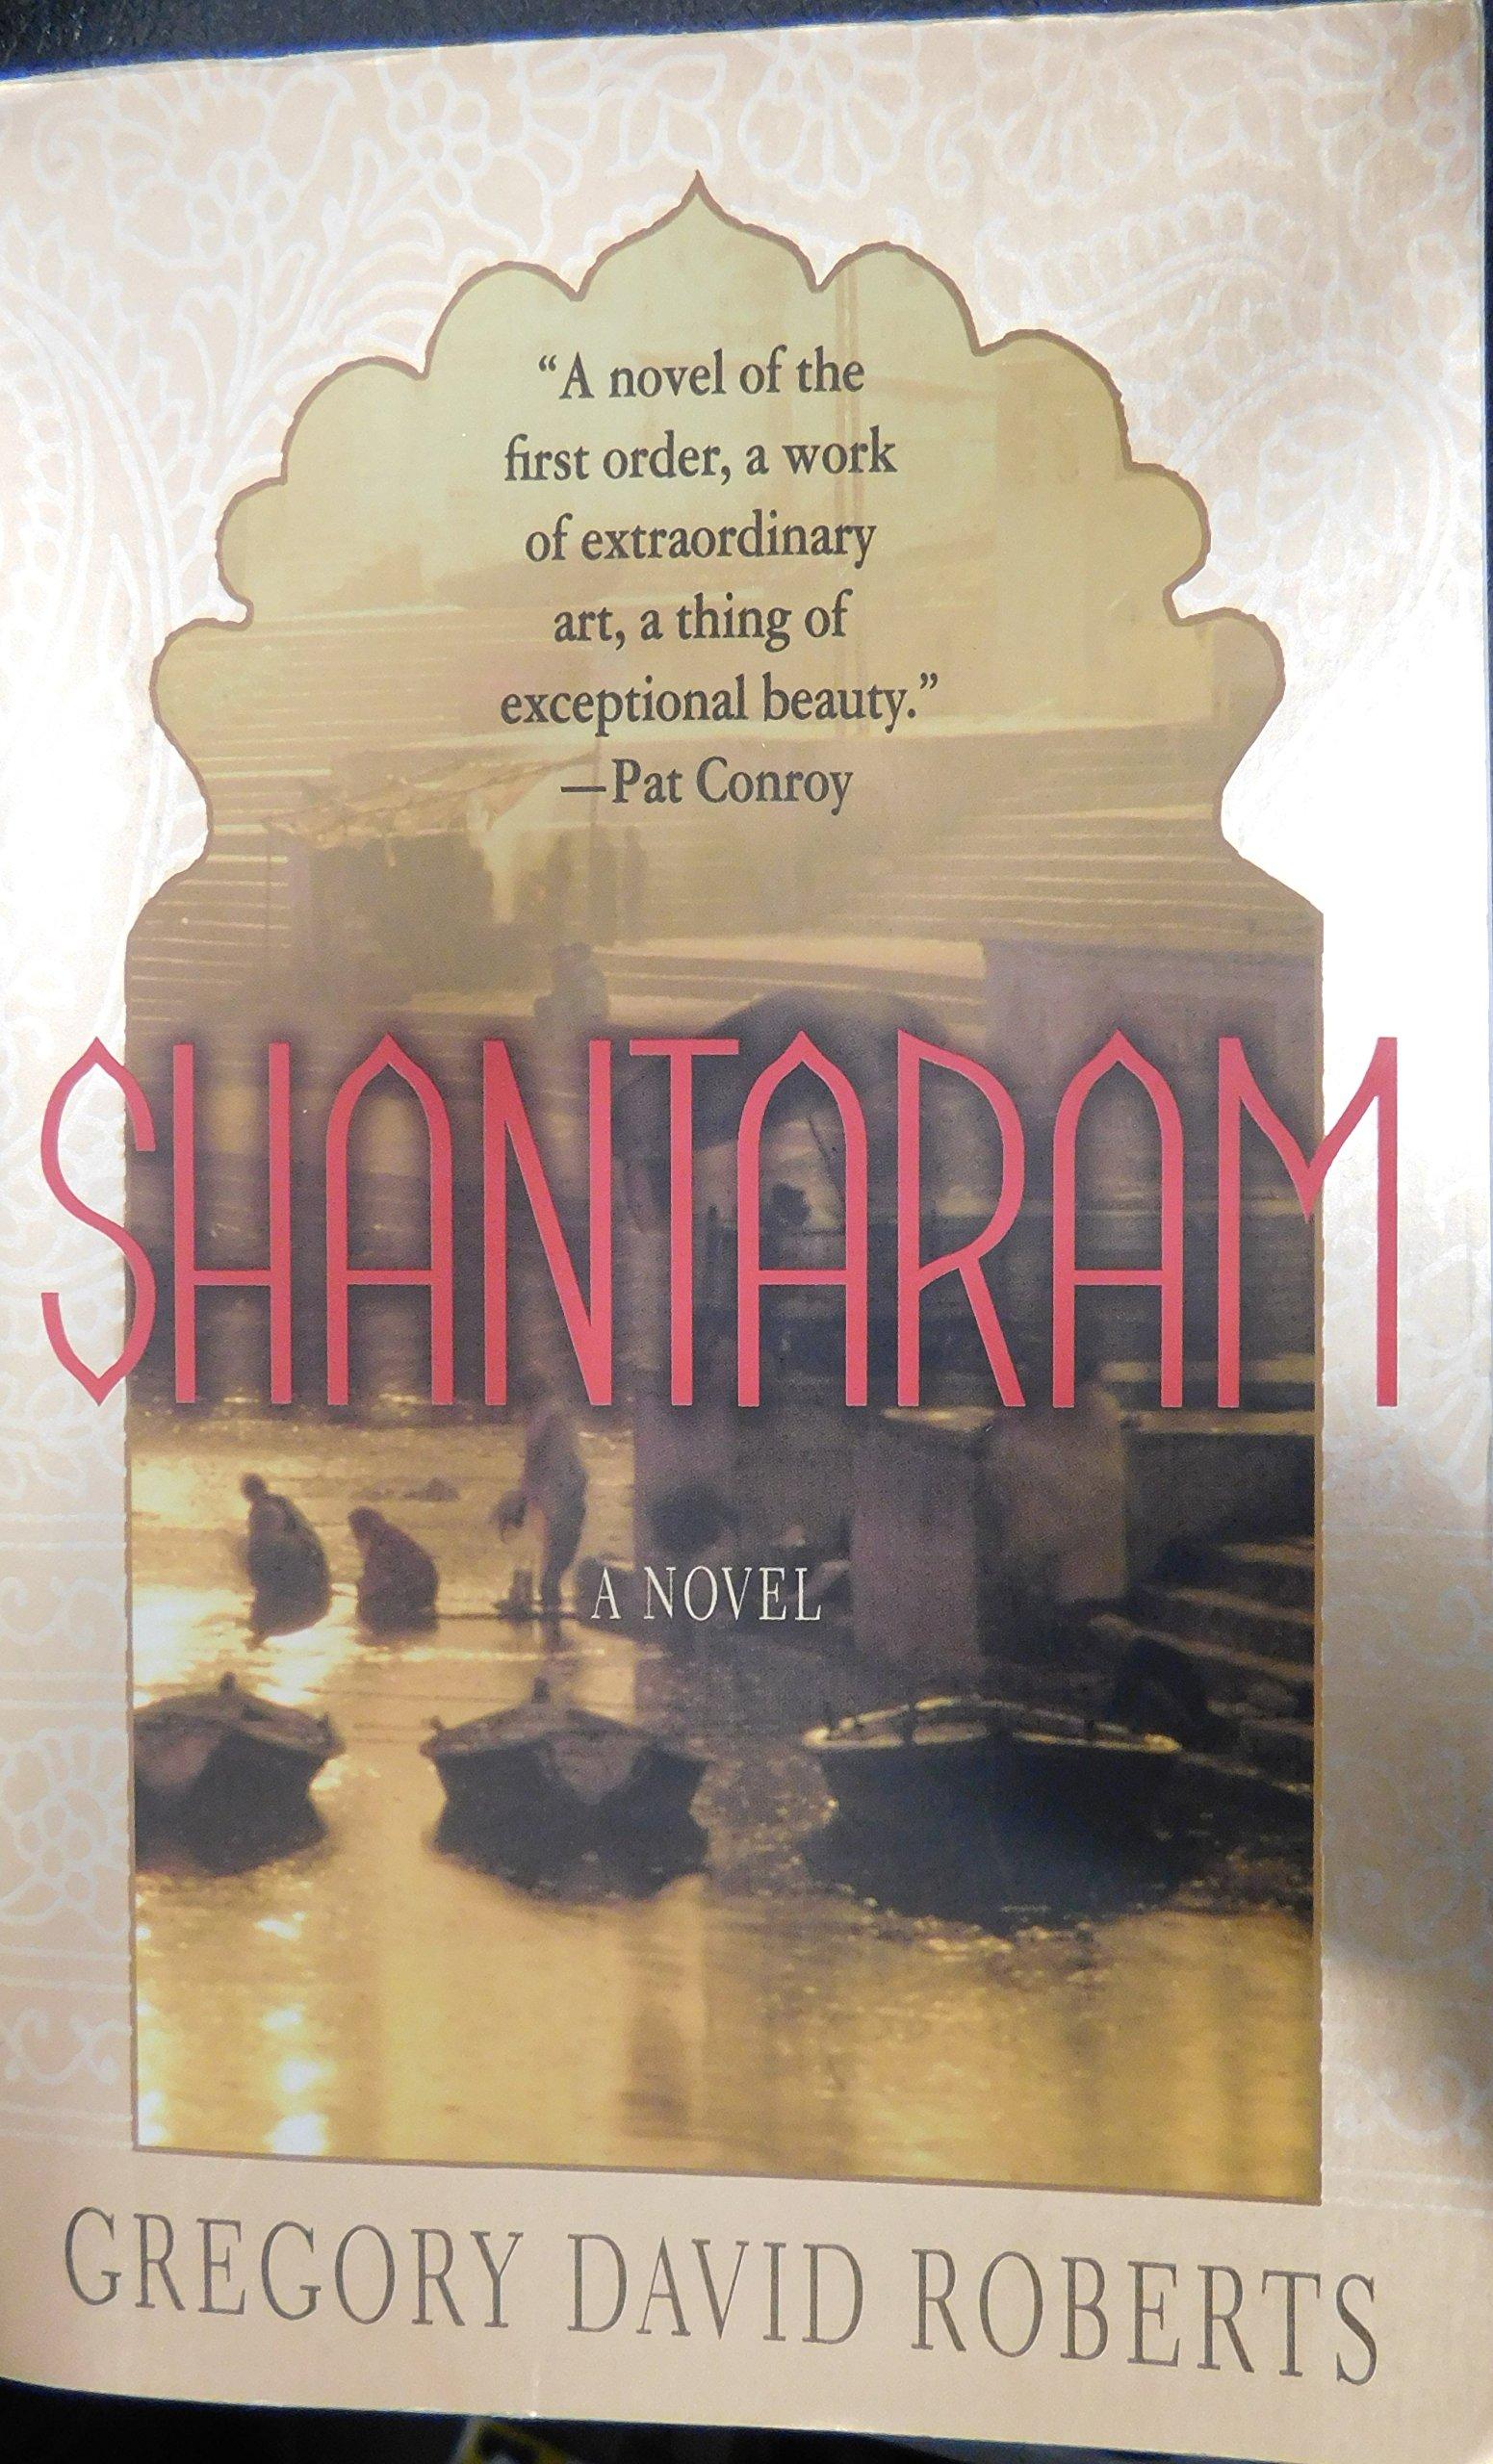 Shantaram Novel Gregory David Roberts product image